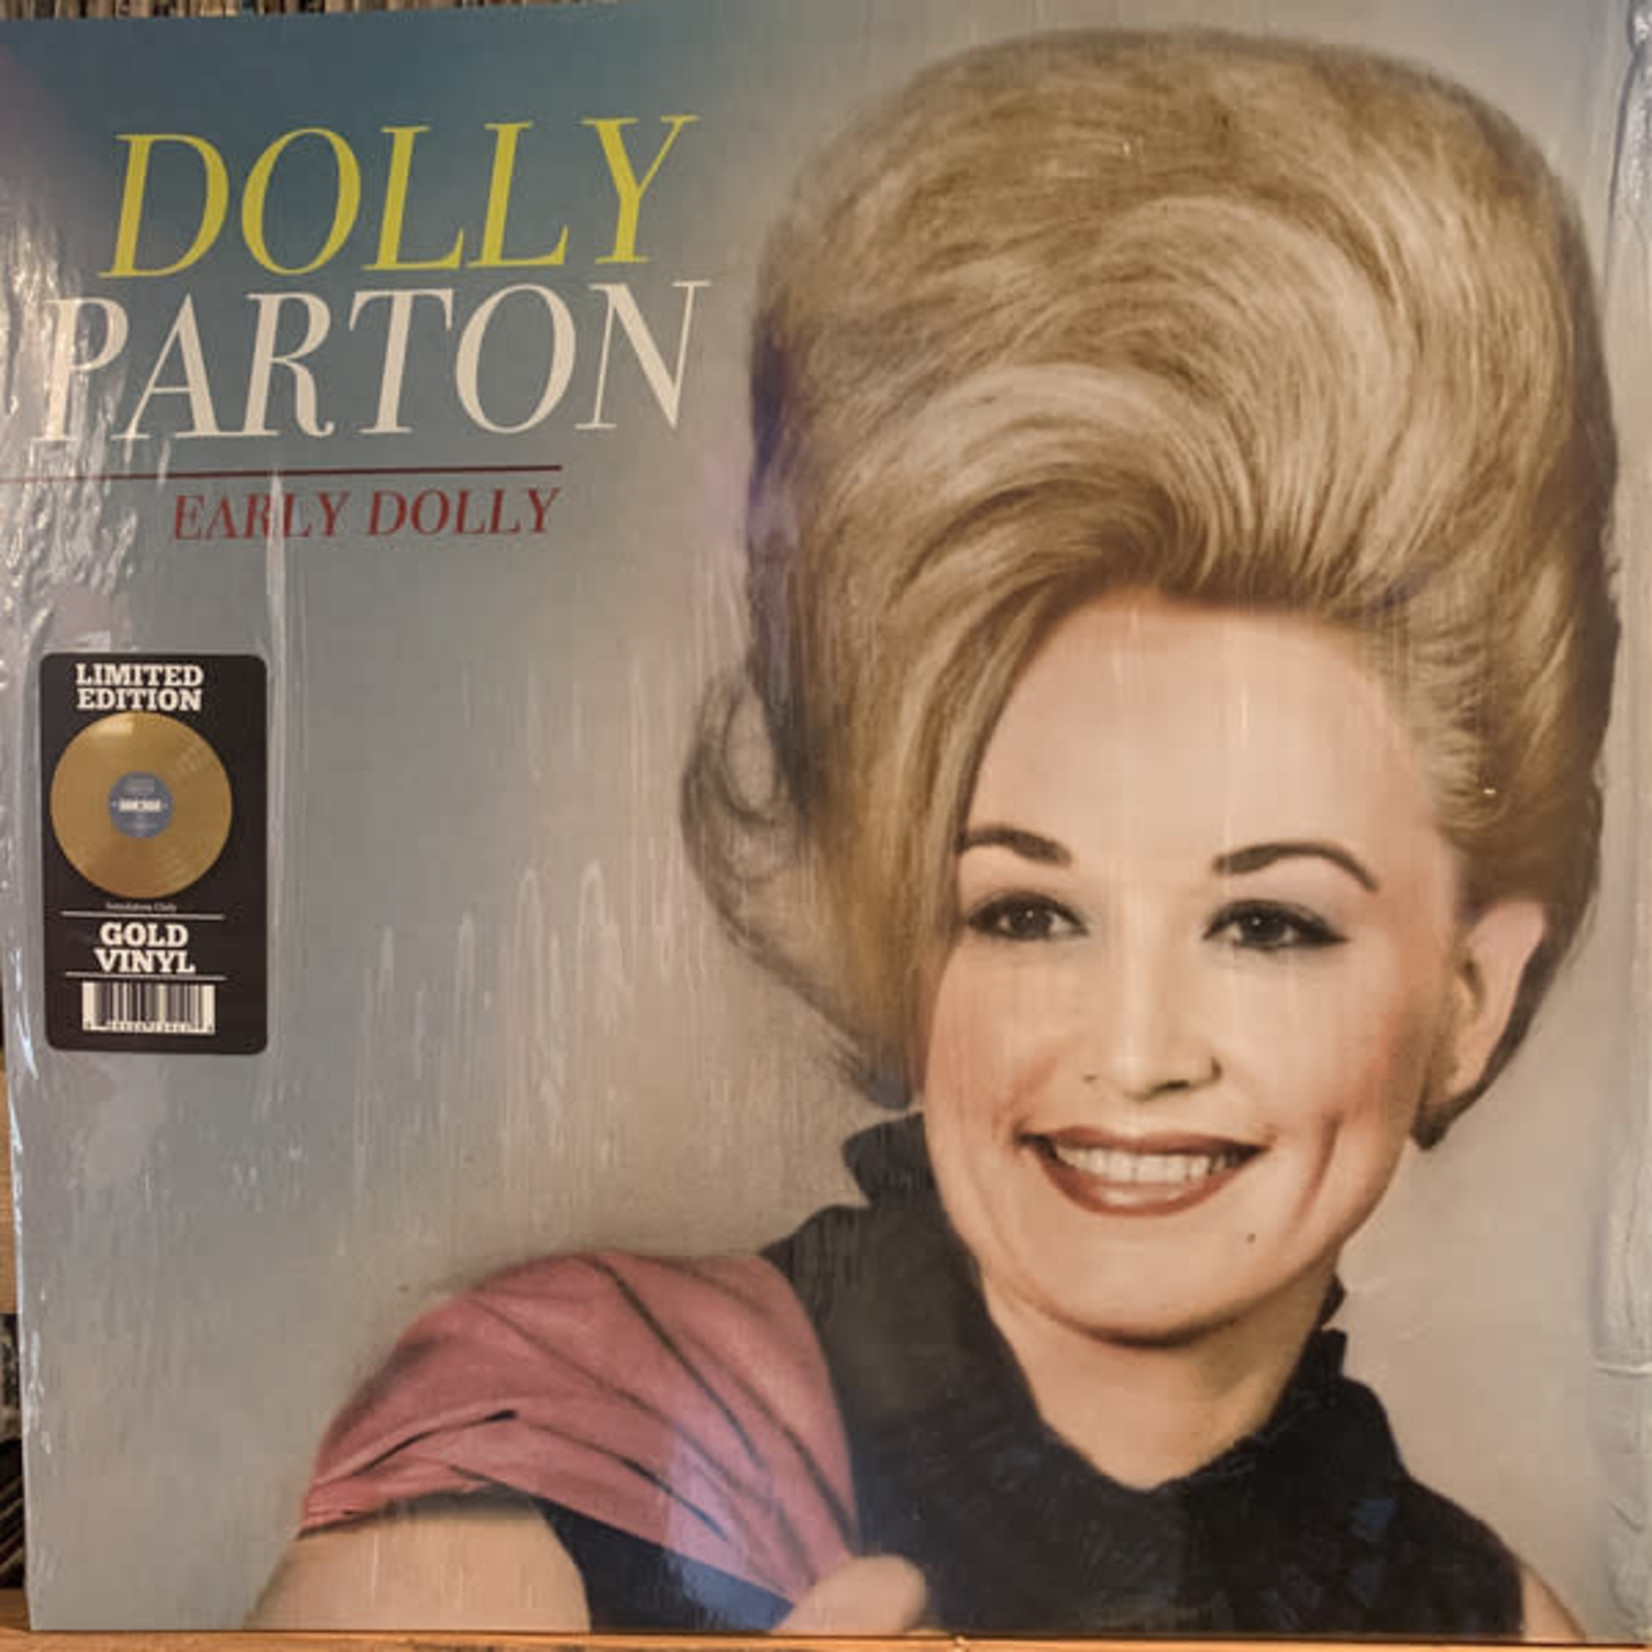 DOLLY PARTON EARLY DOLLY  LTD EDITION GOLD VINYL LP